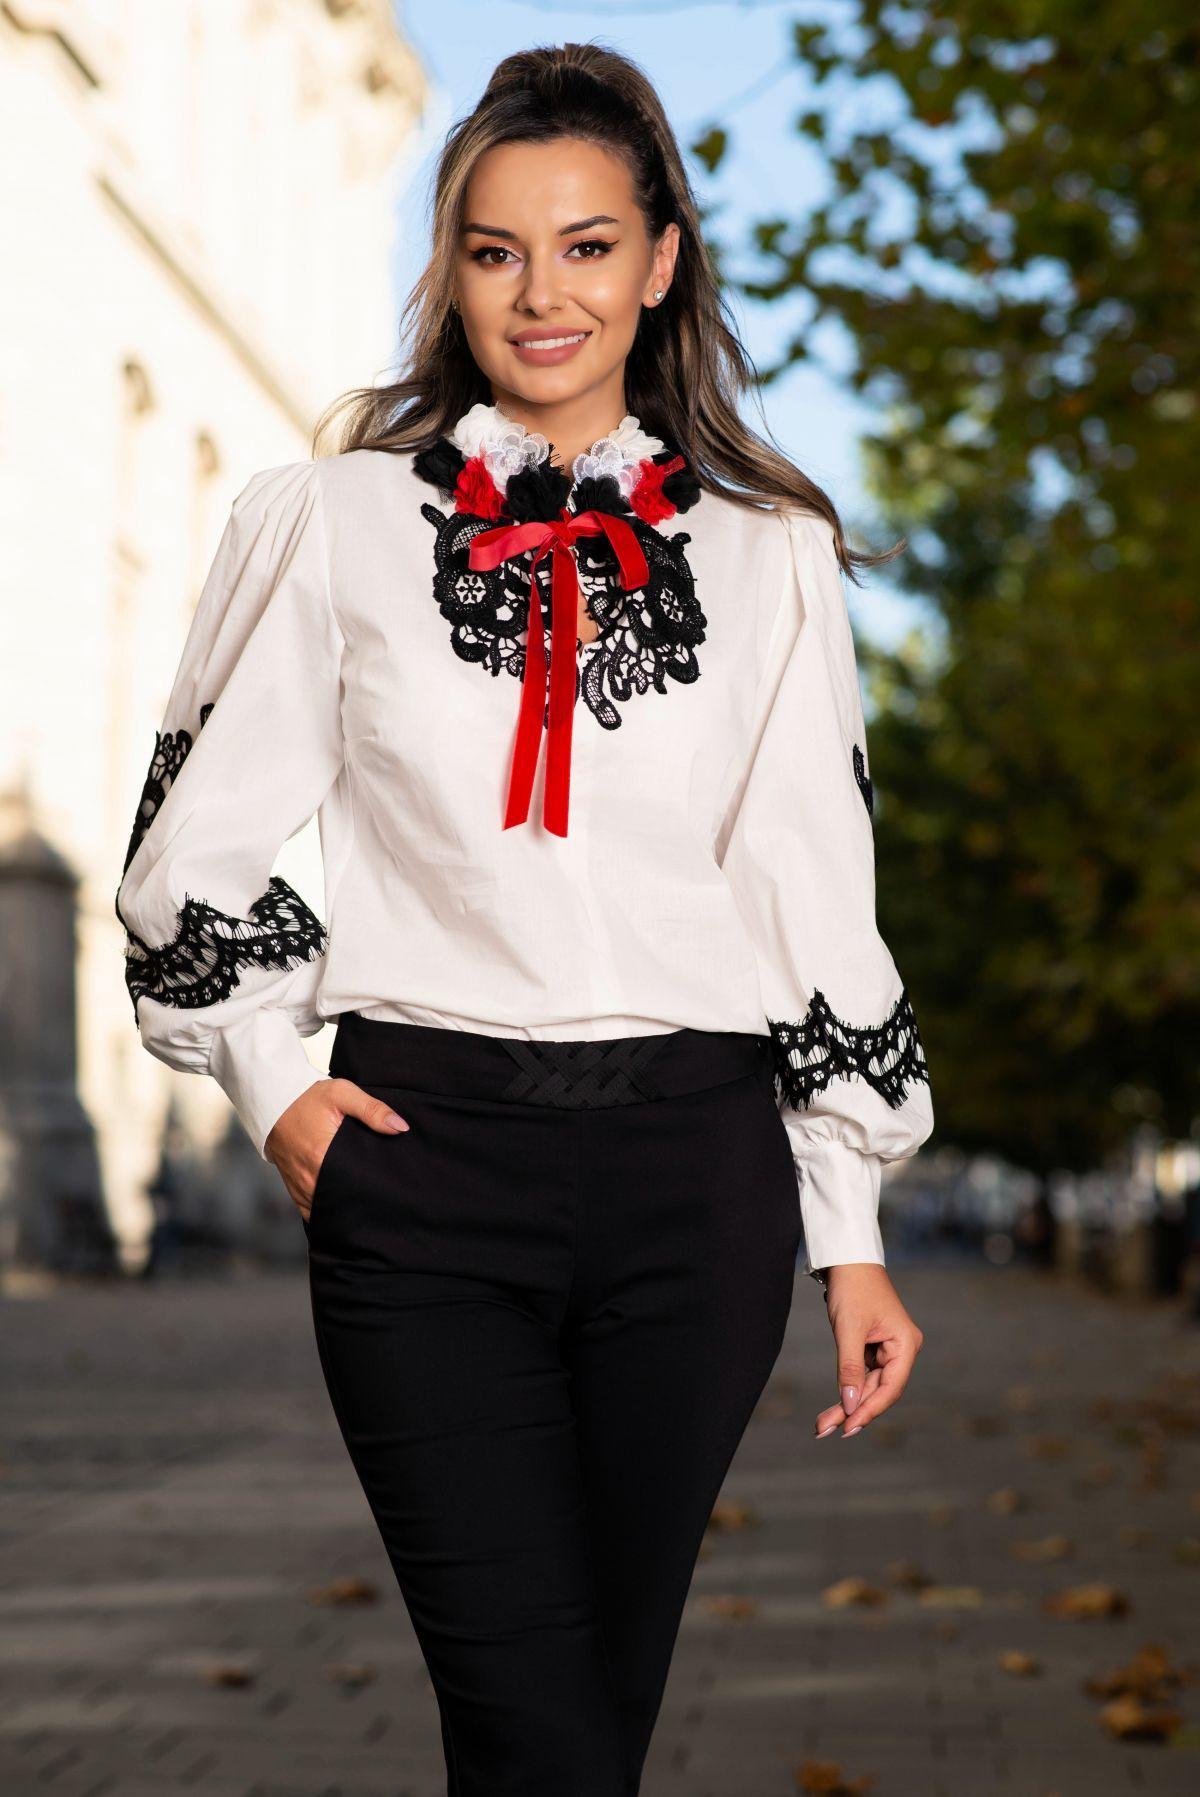 Bluza alba traditionala din bumbac cu flori 3D si broderie neagra aplicata